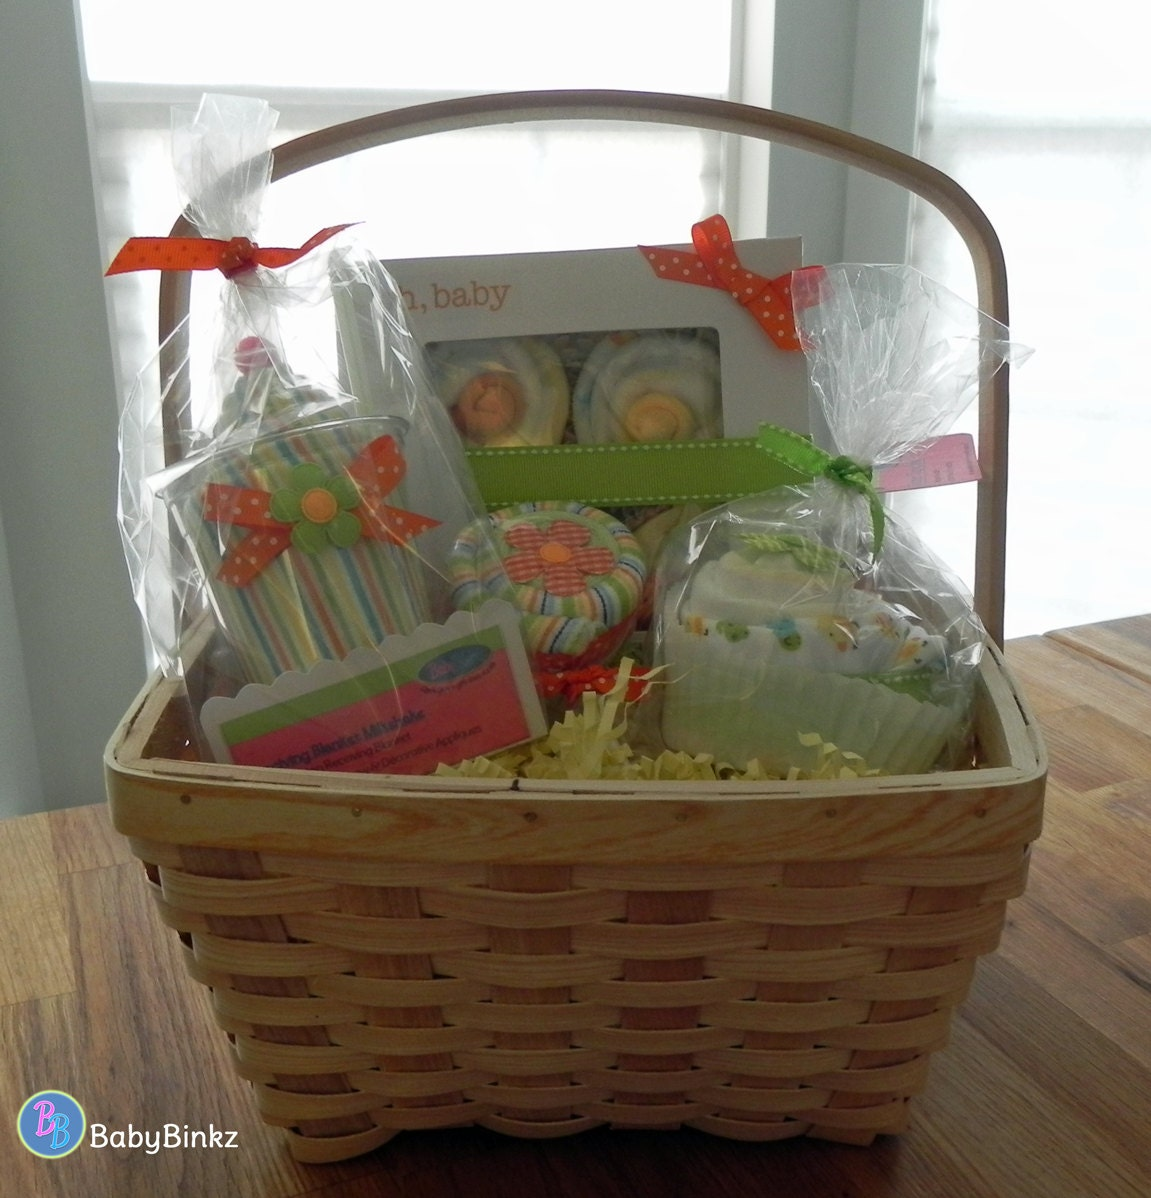 Unique Gift Basket Ideas: BabyBinkz Gift Basket Unique Baby Shower Gift Or